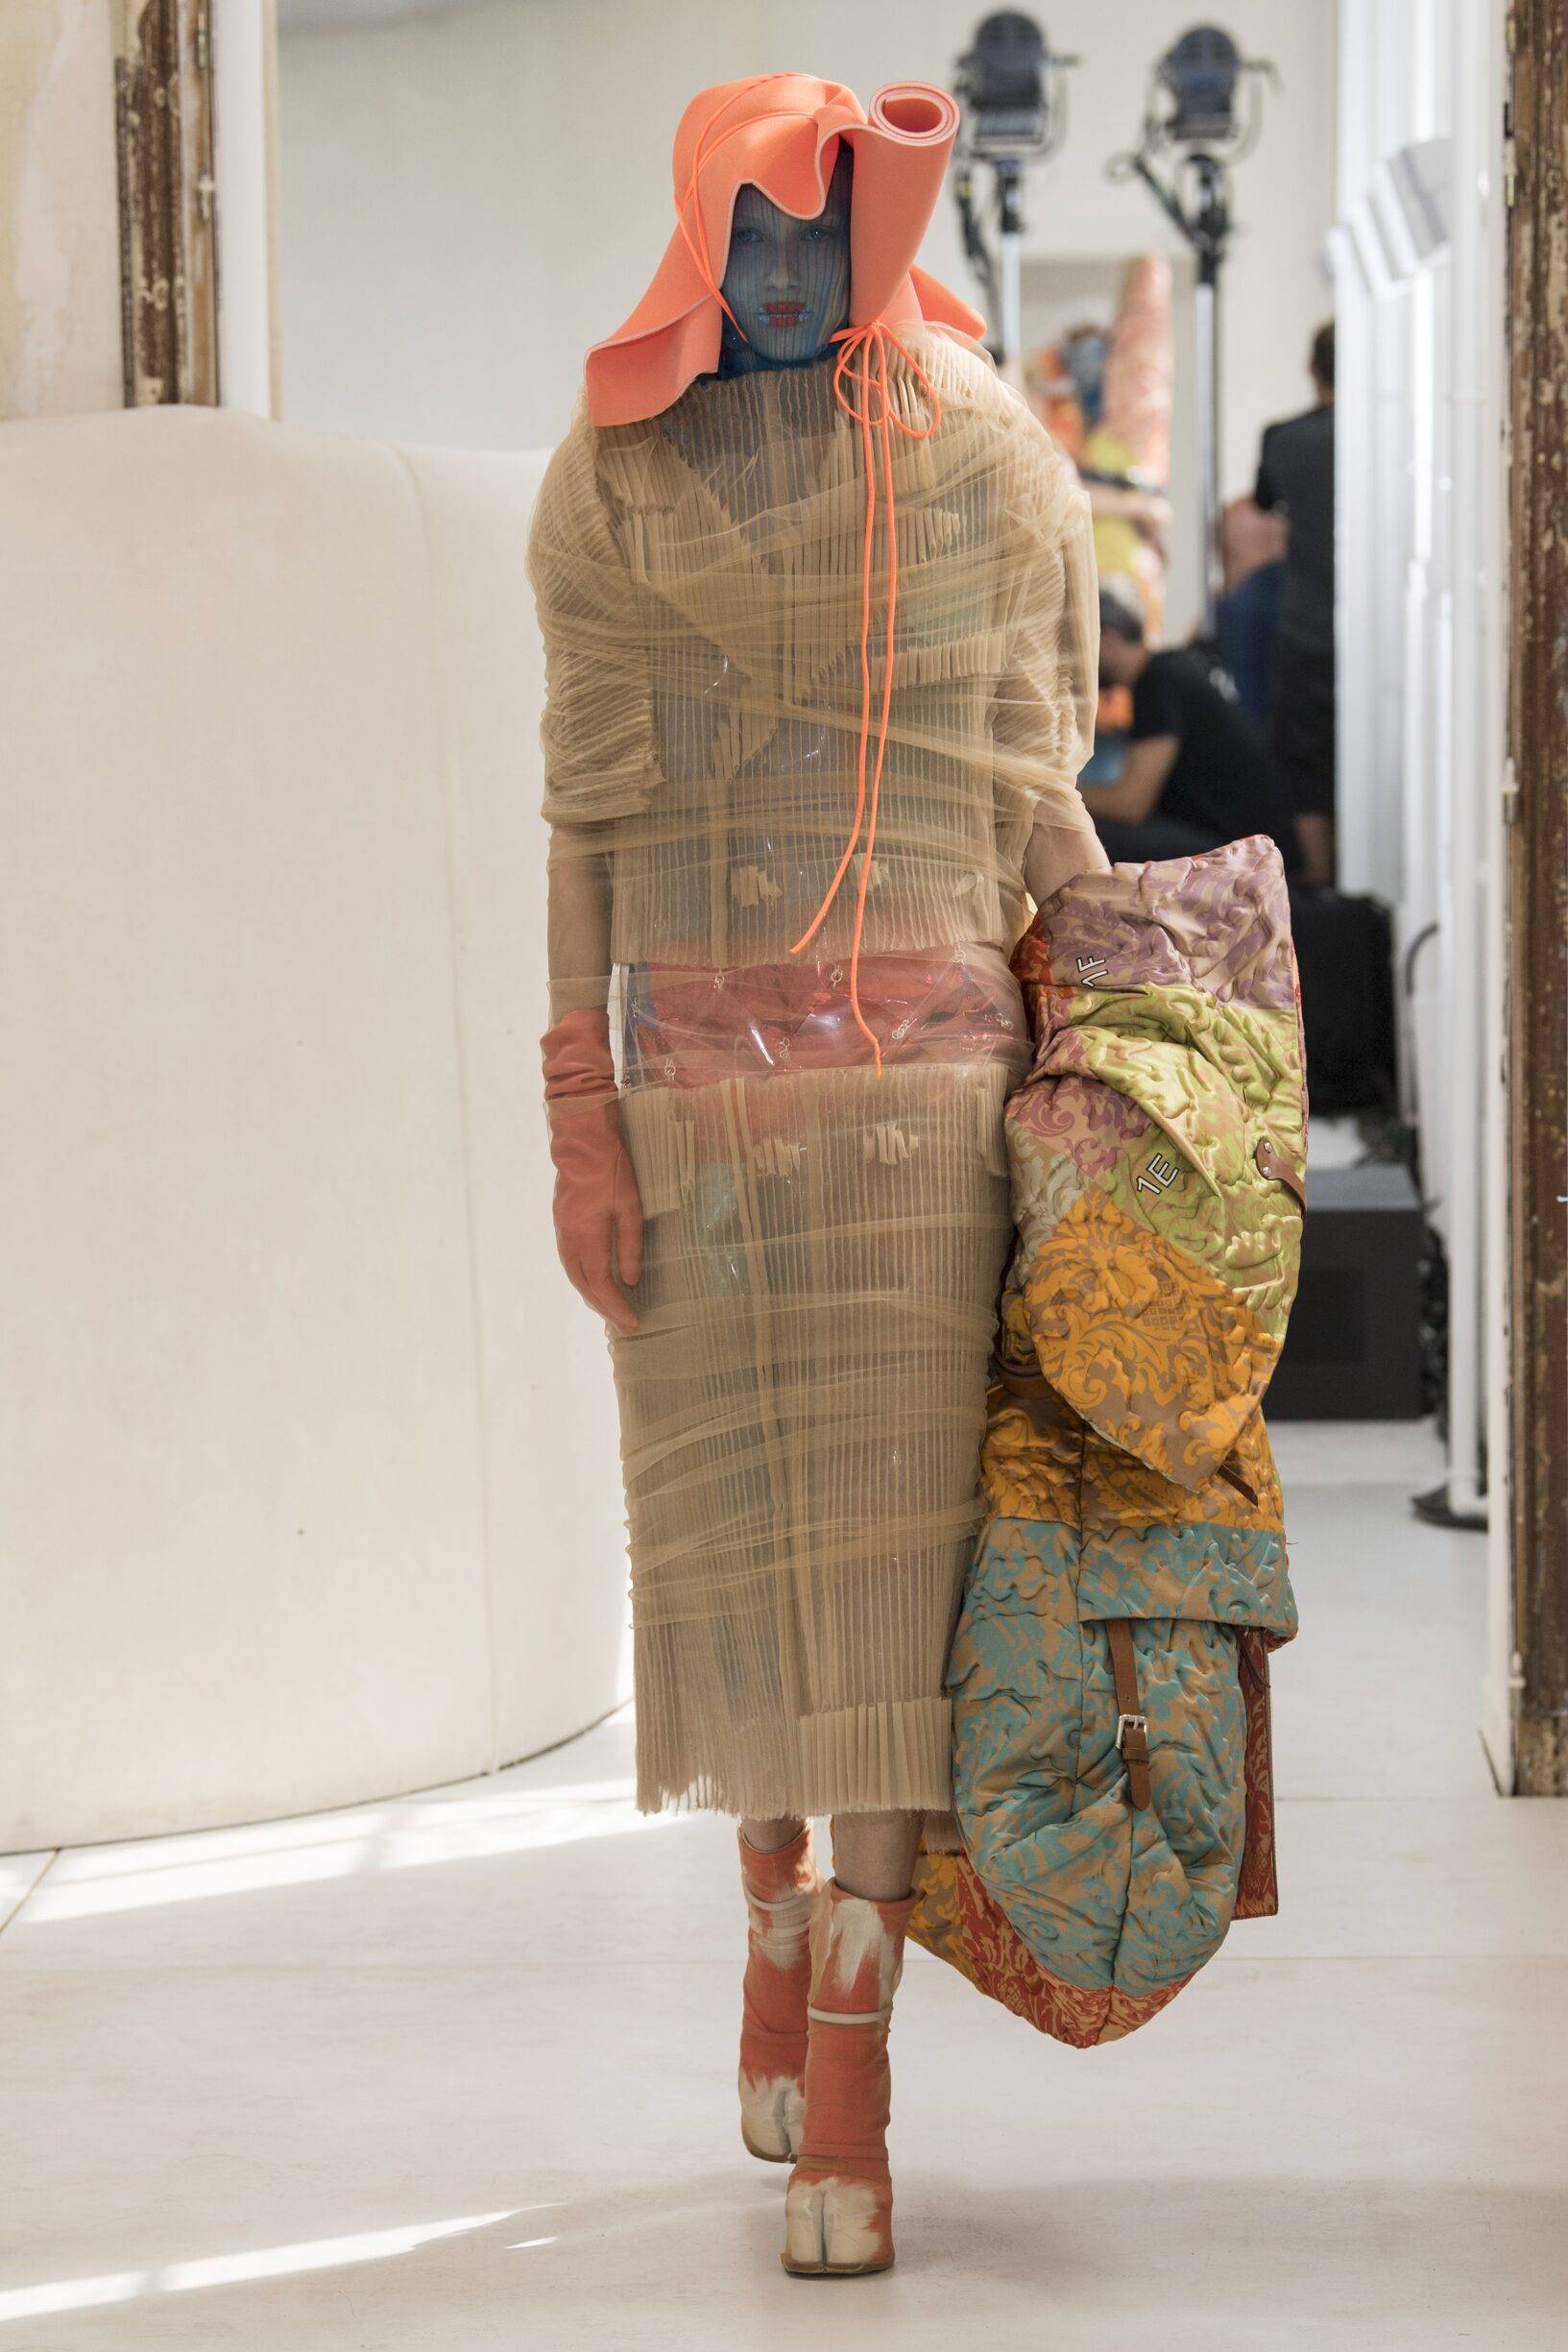 Fashion Show Woman Model Maison Margiela Artisanal Catwalk